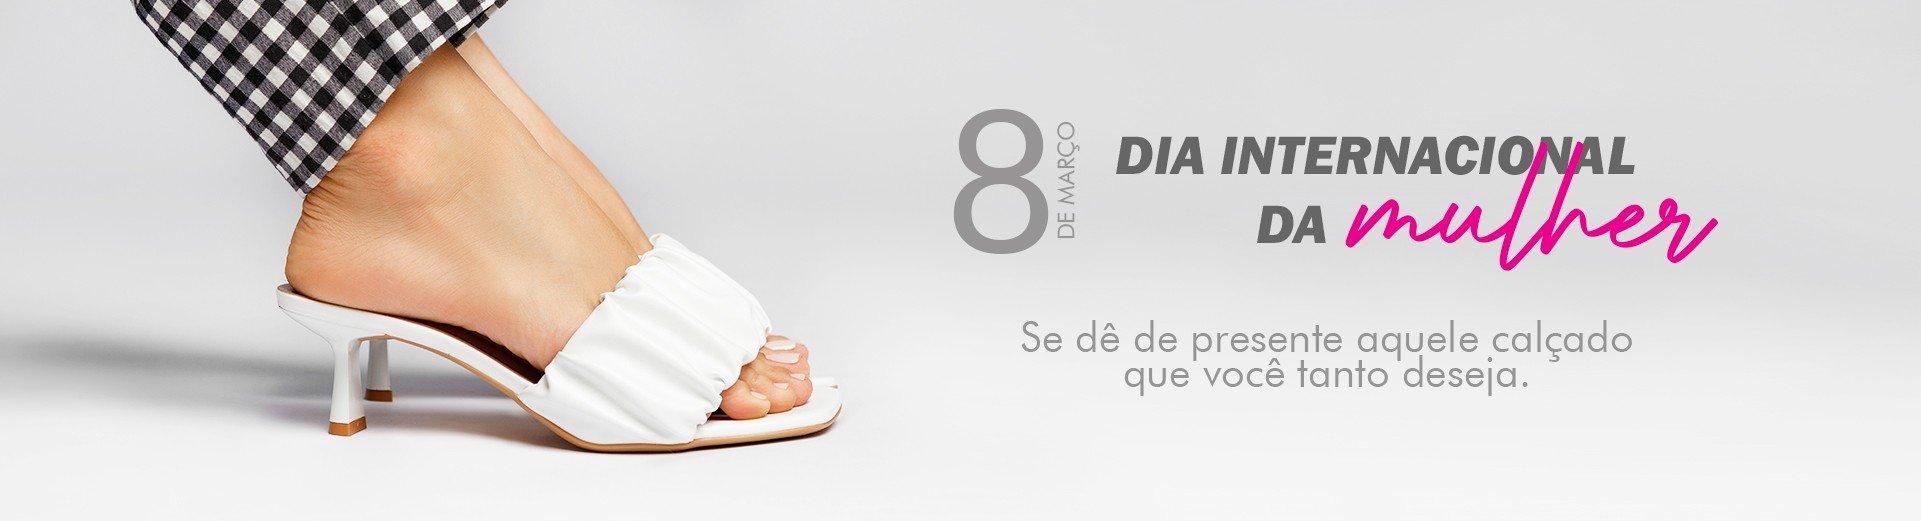 banner principal dia da mulher desktop